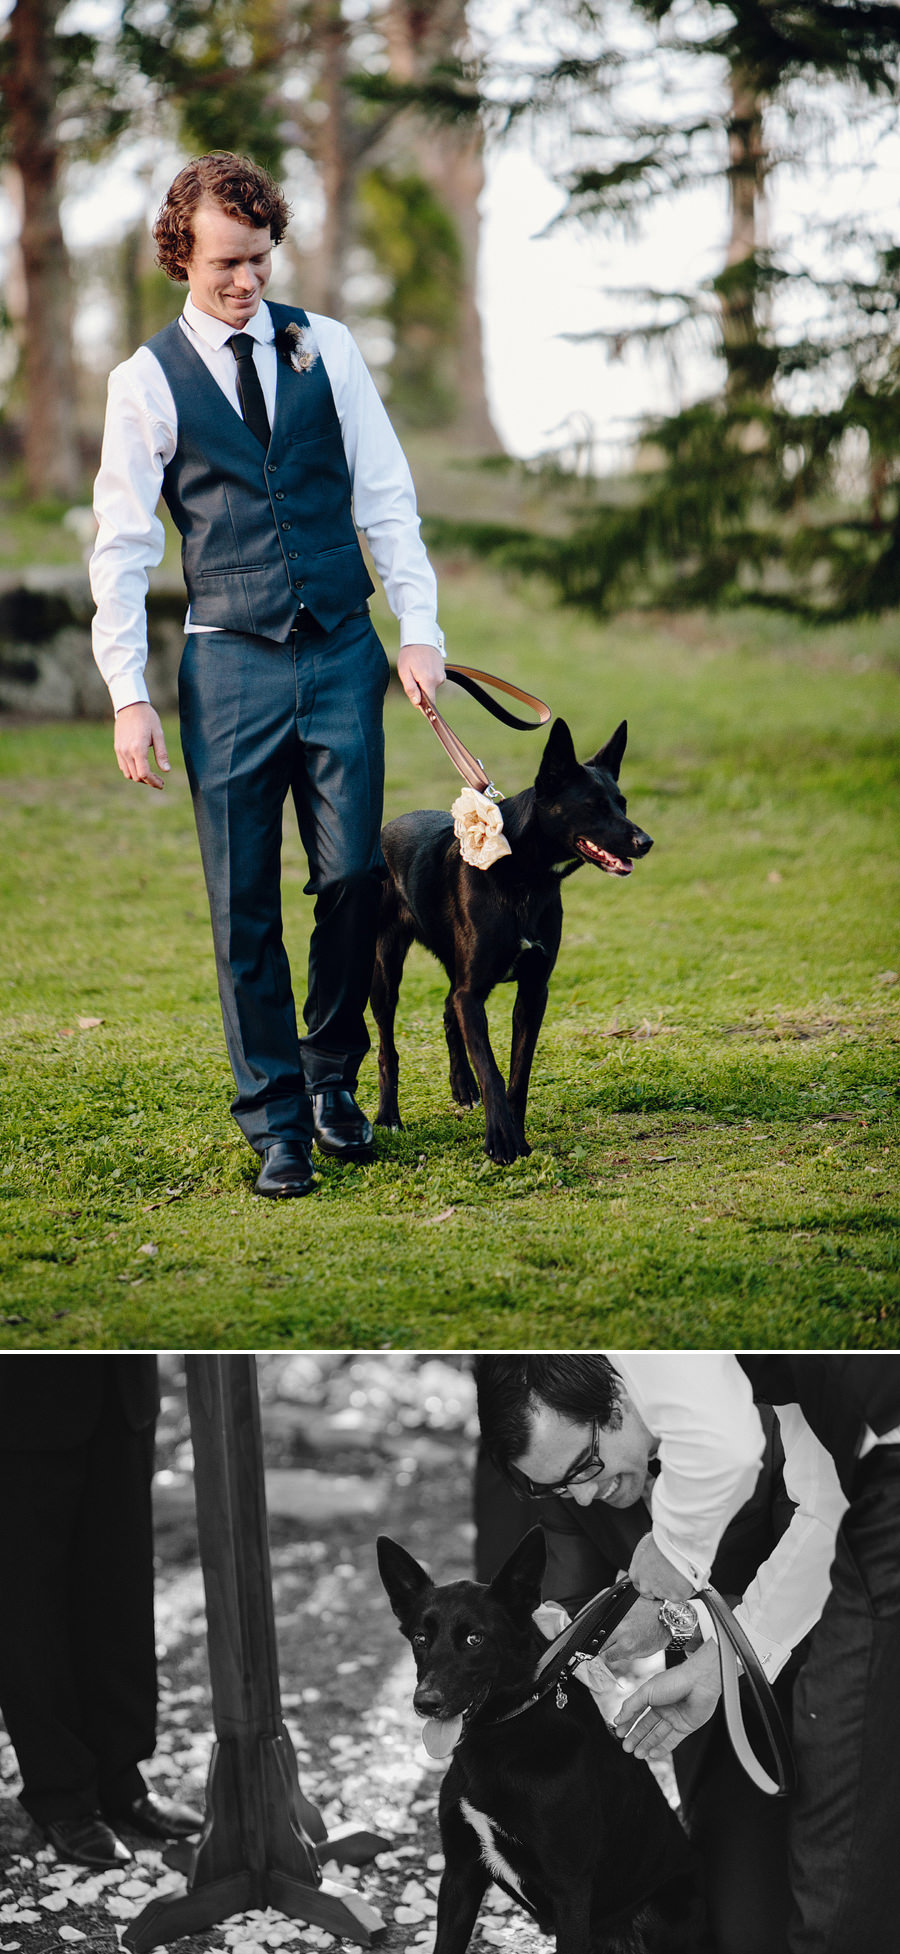 Backyard Wedding Photography: Ceremony